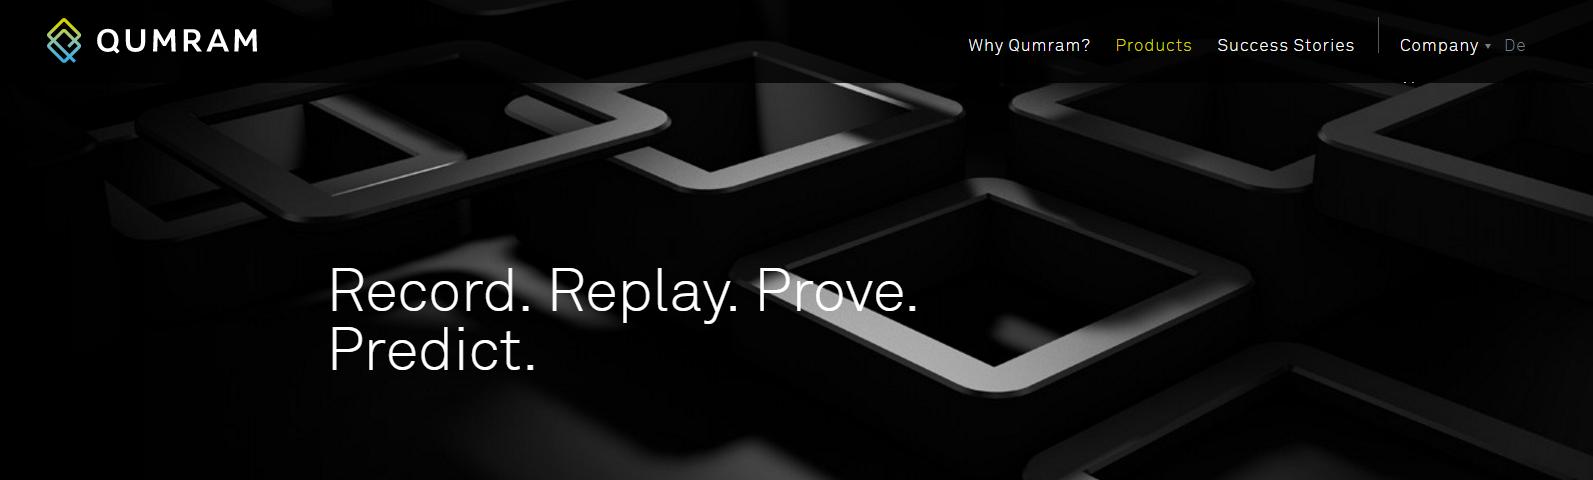 Qumram: Record. Replay. Preserve. Prove. Predict